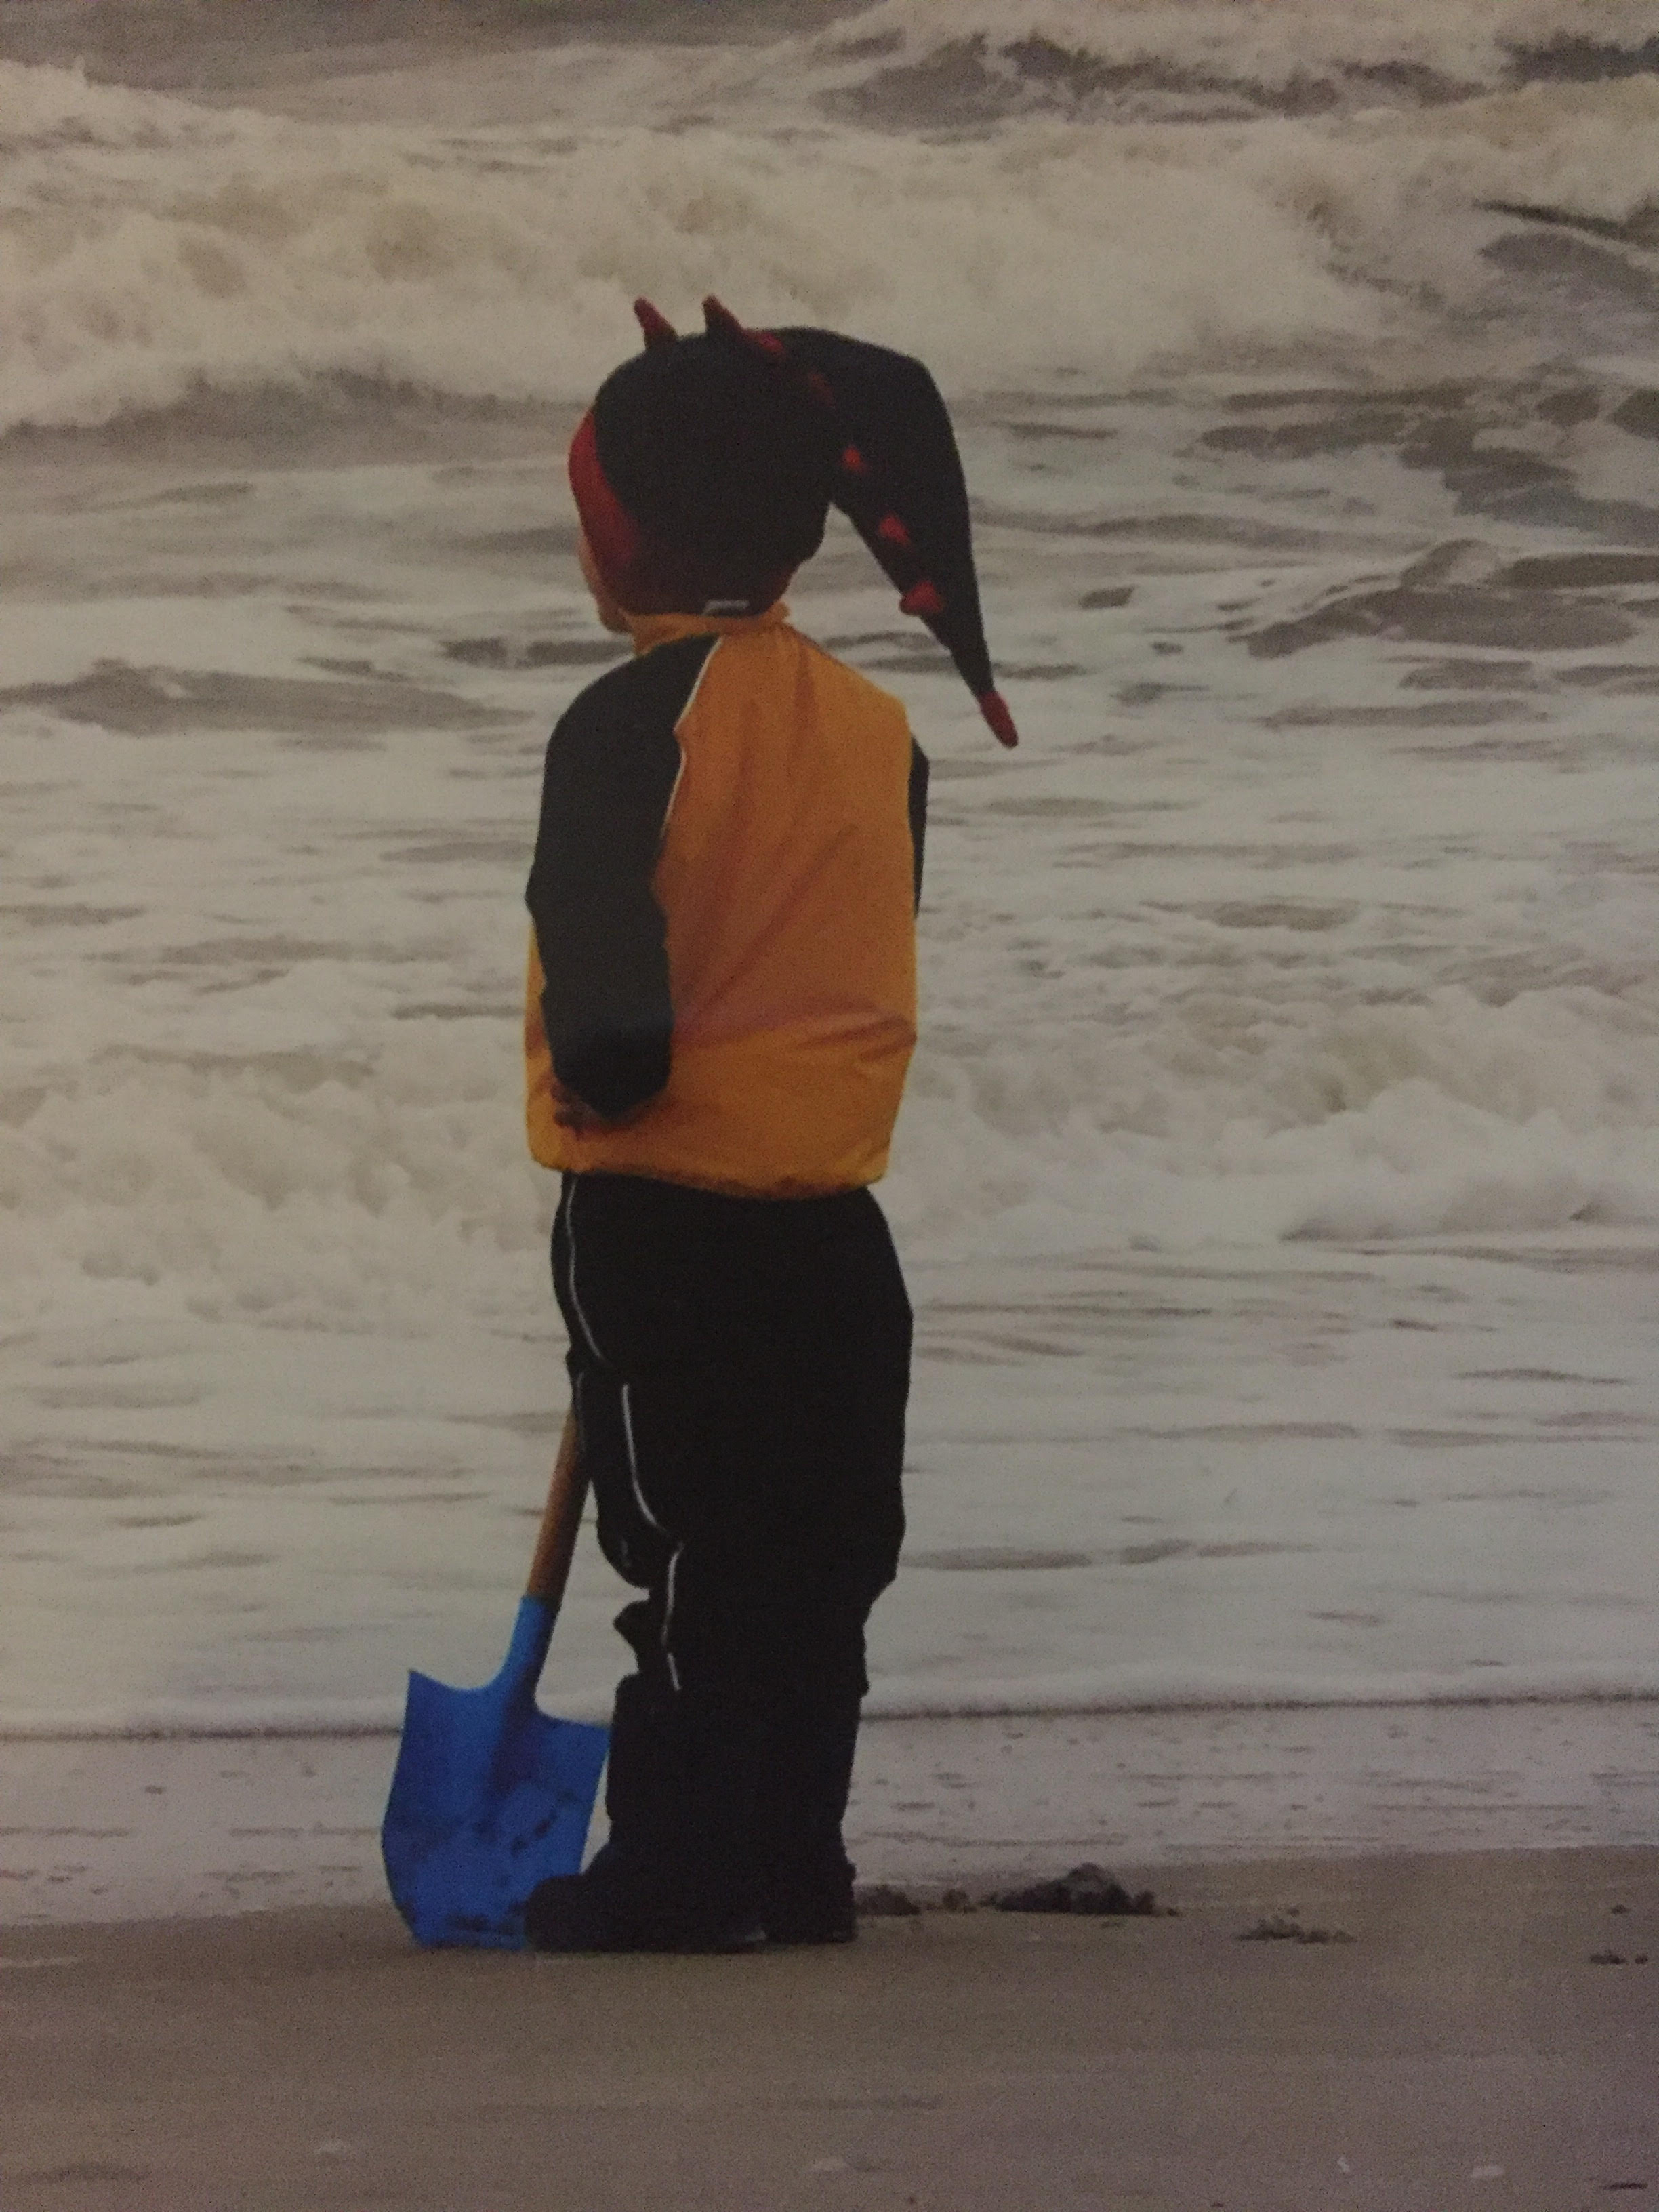 D rex hat on beach on Thanksgiving